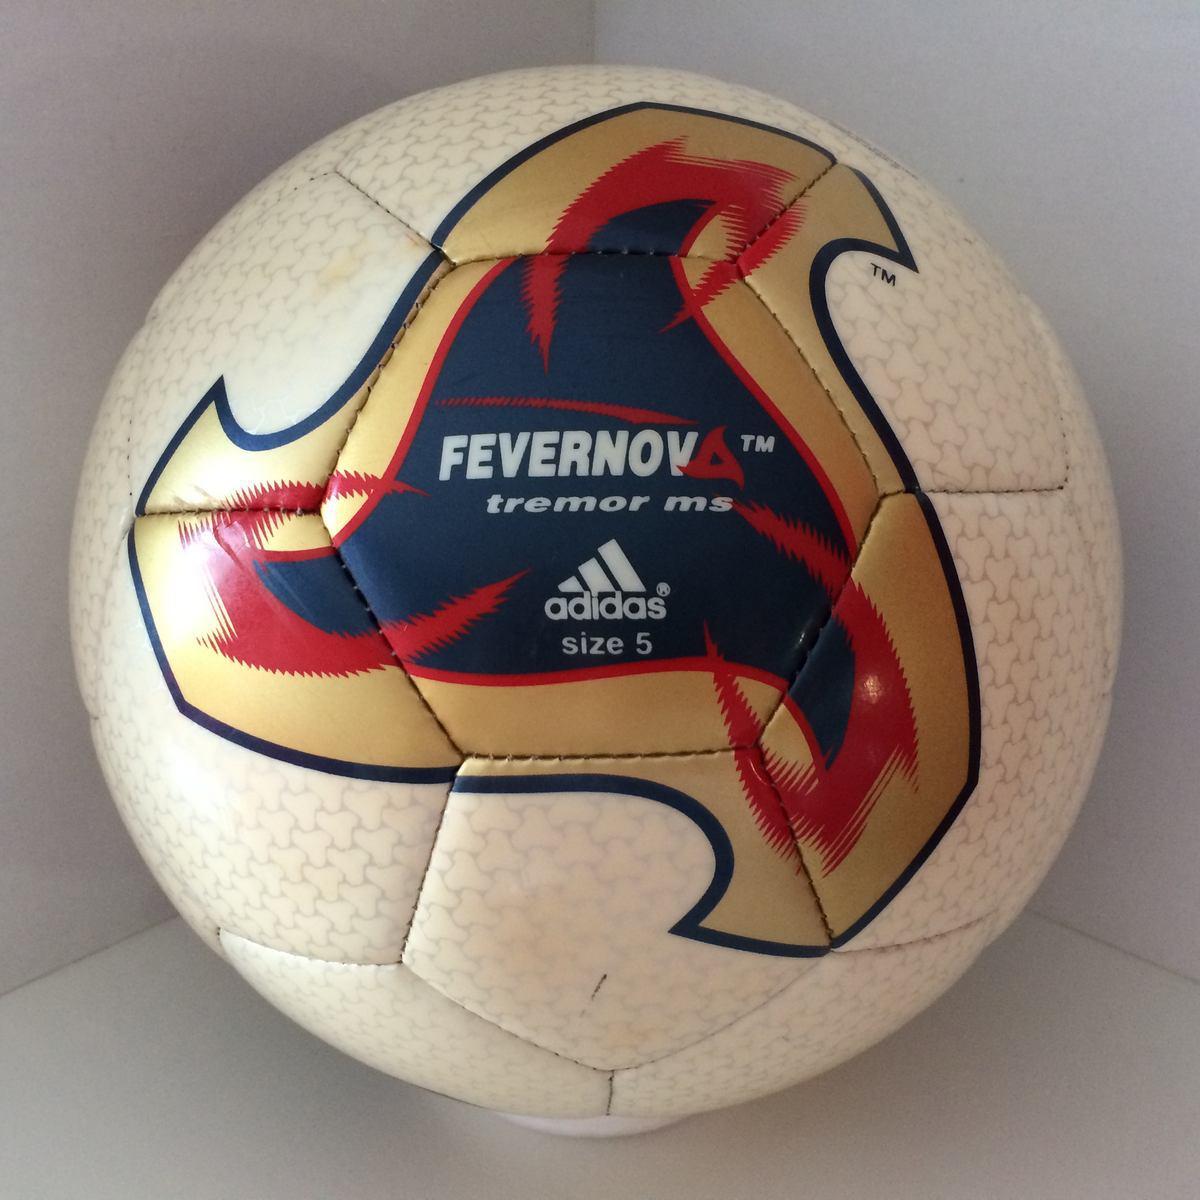 Adidas Fevernova Regular Tremor Ms Matchballseu